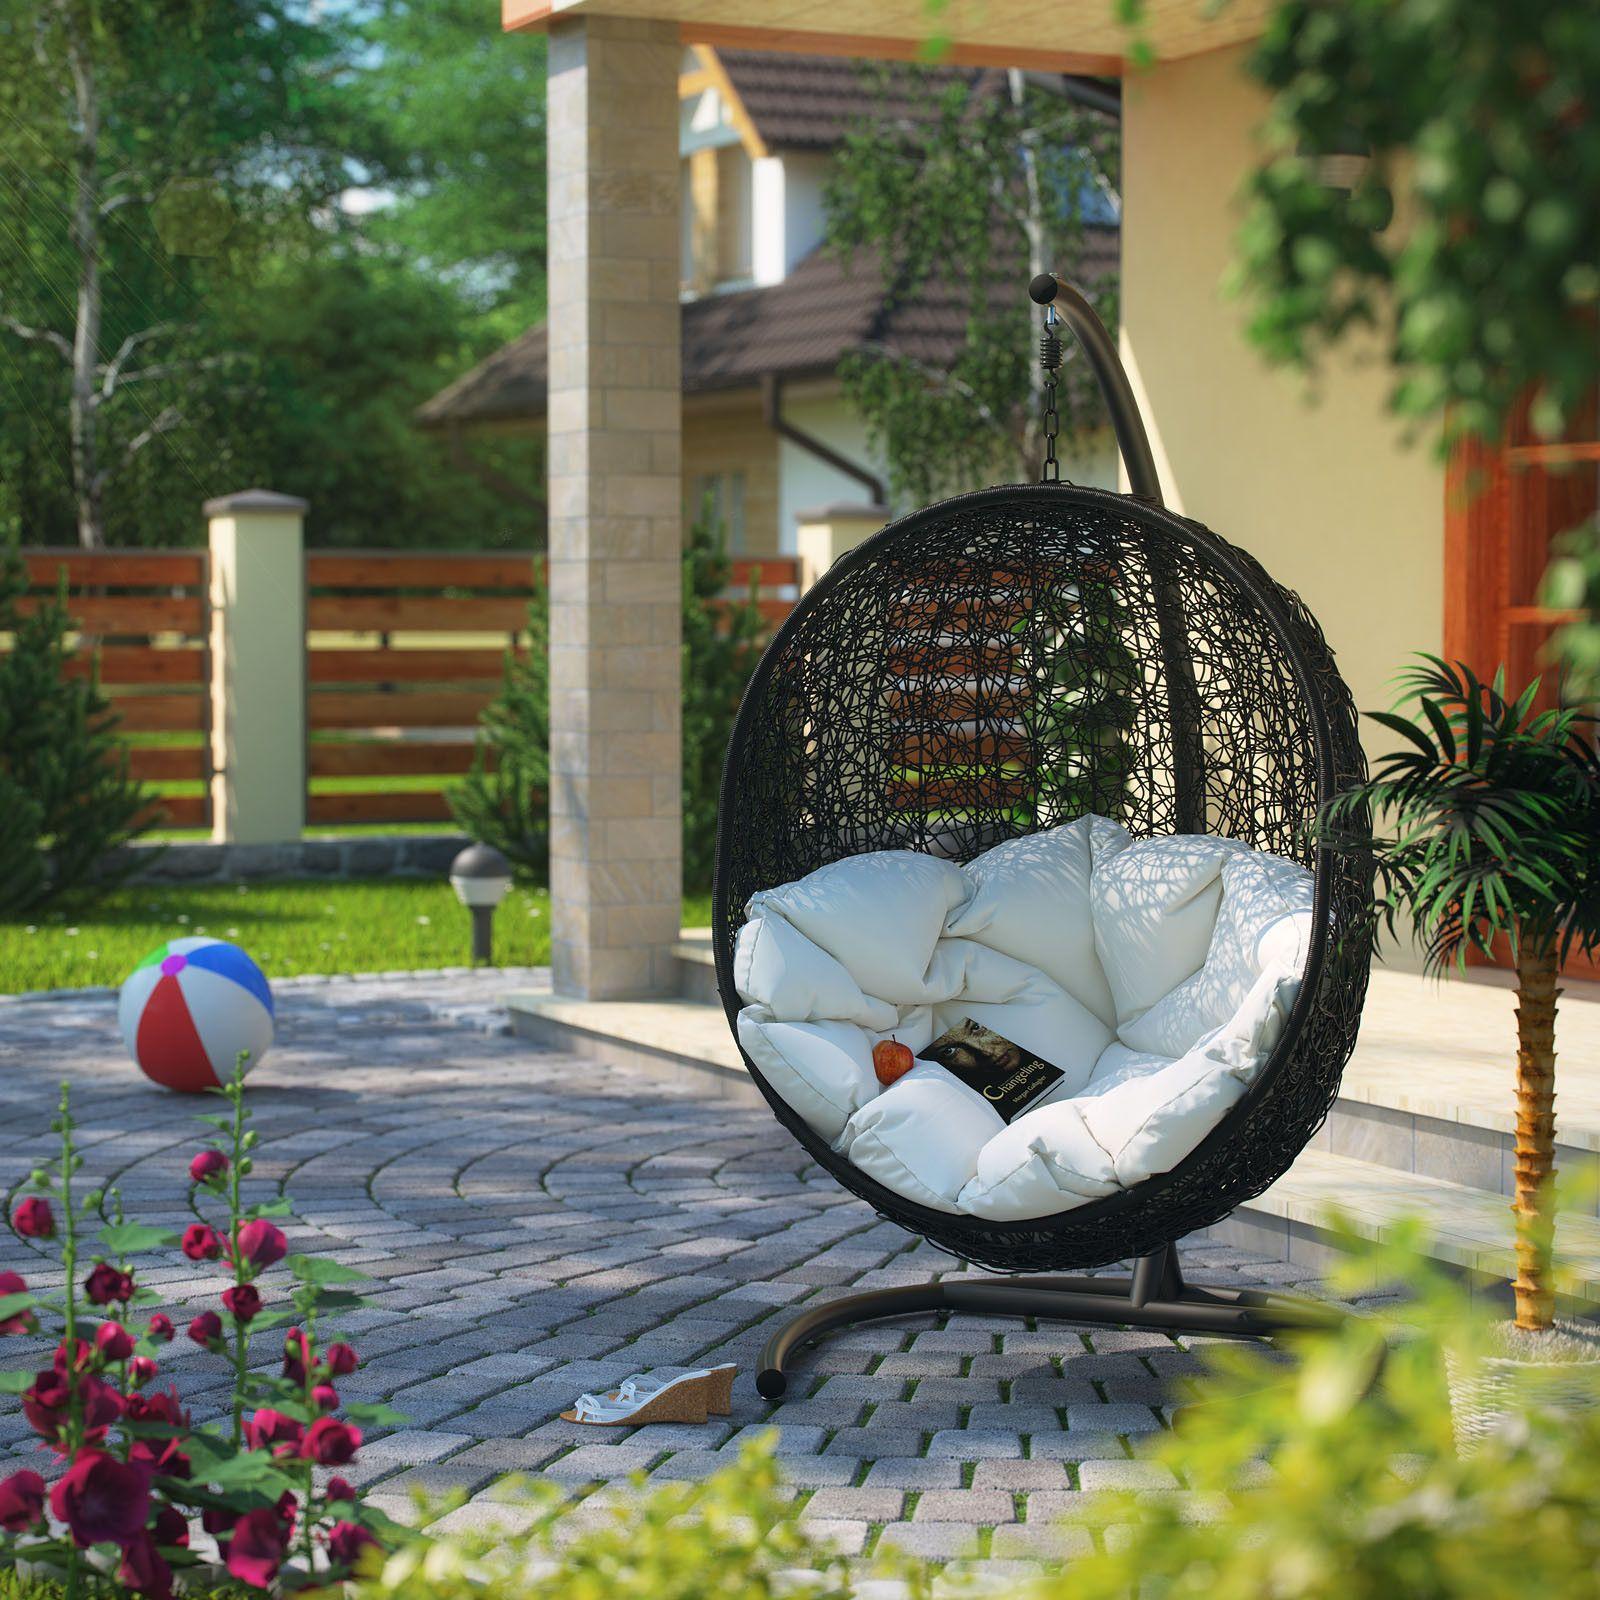 Kitchen Furniture Lamp Chair Designerfurniture Diningroom Homedecor Sofa Table Livingroom Swing Chair Outdoor Patio Swing Swinging Chair